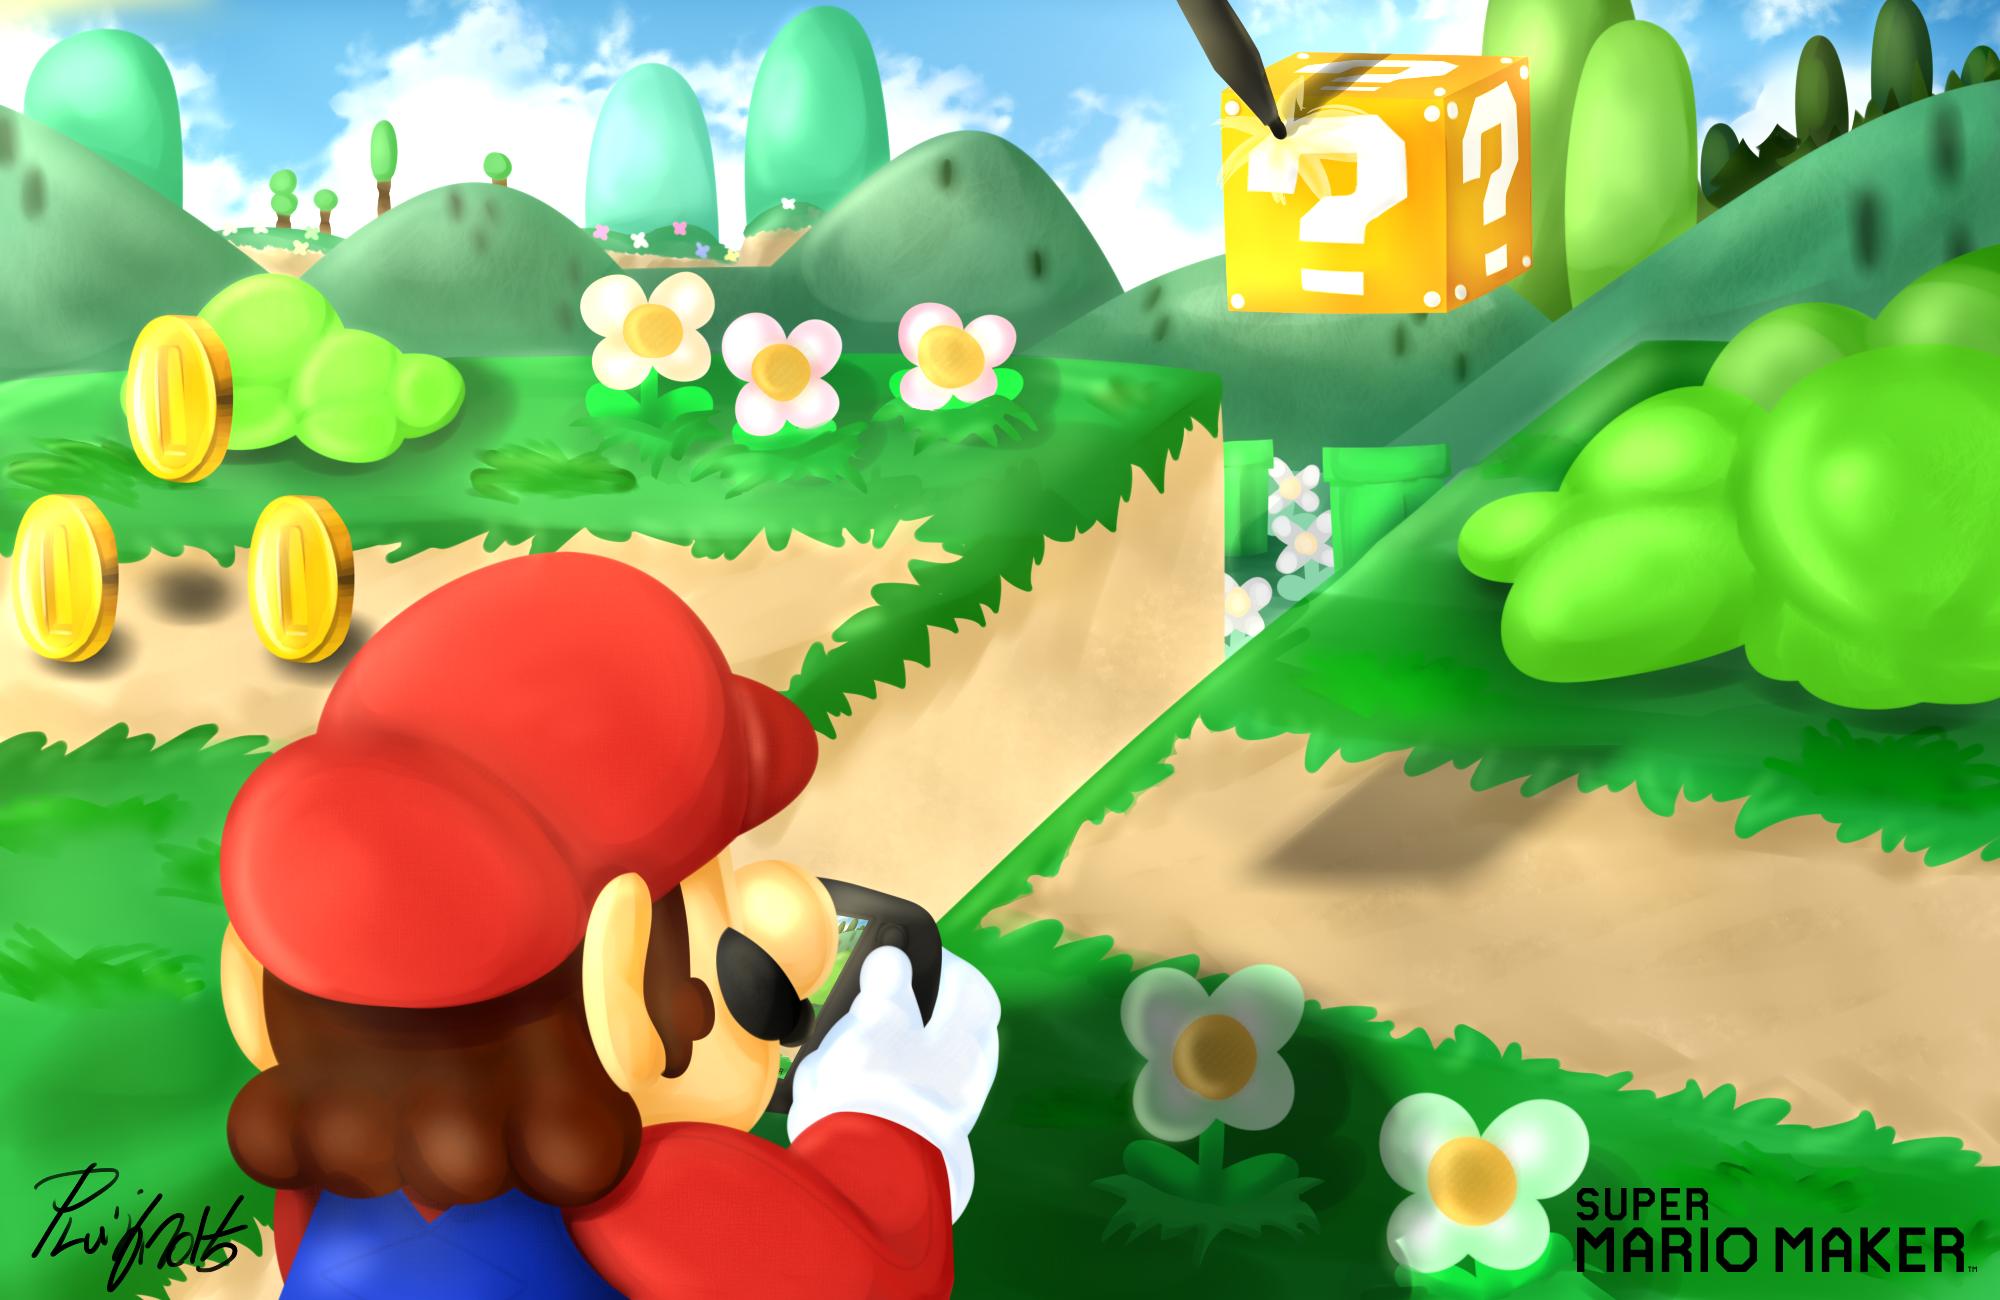 Super Mario Maker Artwork